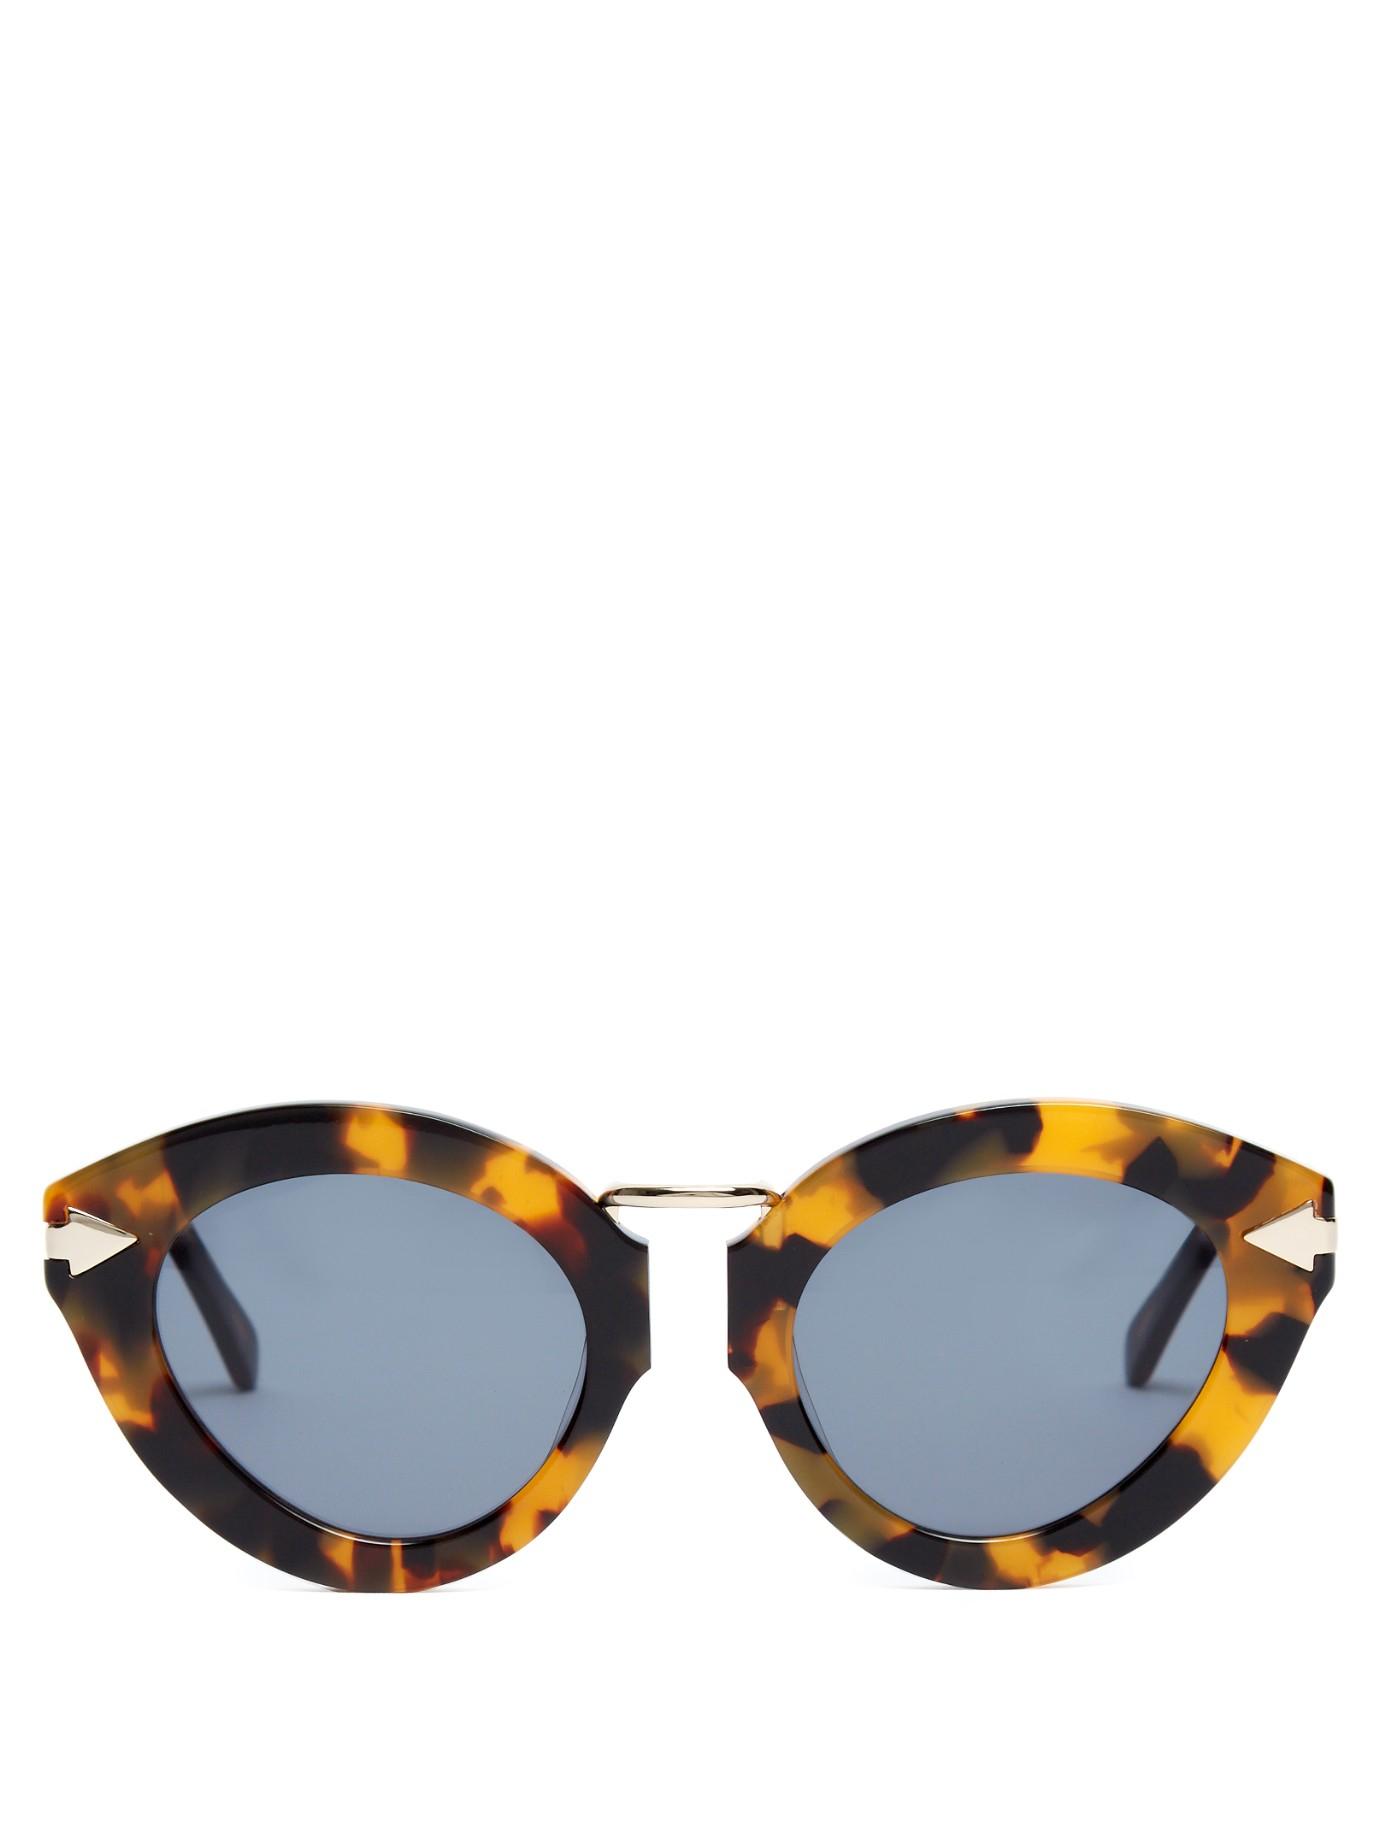 c24f5c31e40 Gallery. Previously sold at  MATCHESFASHION.COM · Women s Tortoiseshell  Sunglasses ...